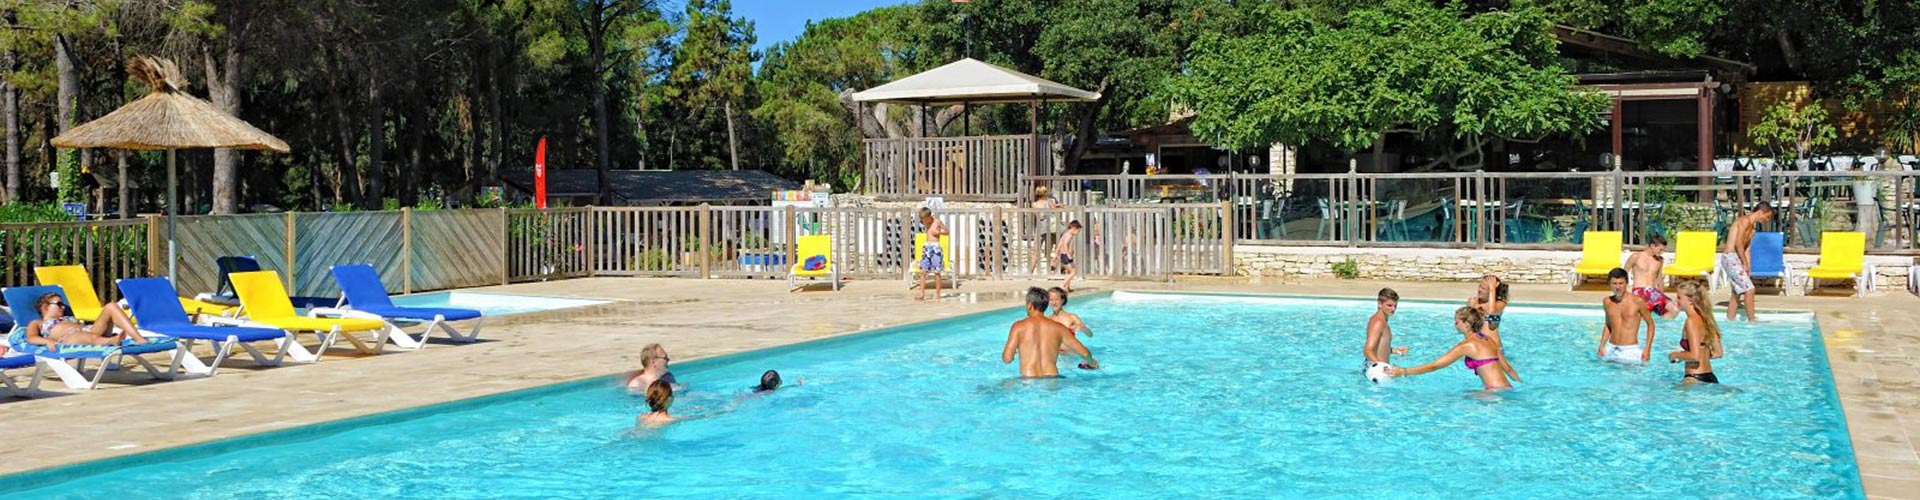 Camping corse du sud bord de mer avec piscine et 3 toiles for Camping martigues avec piscine bord mer